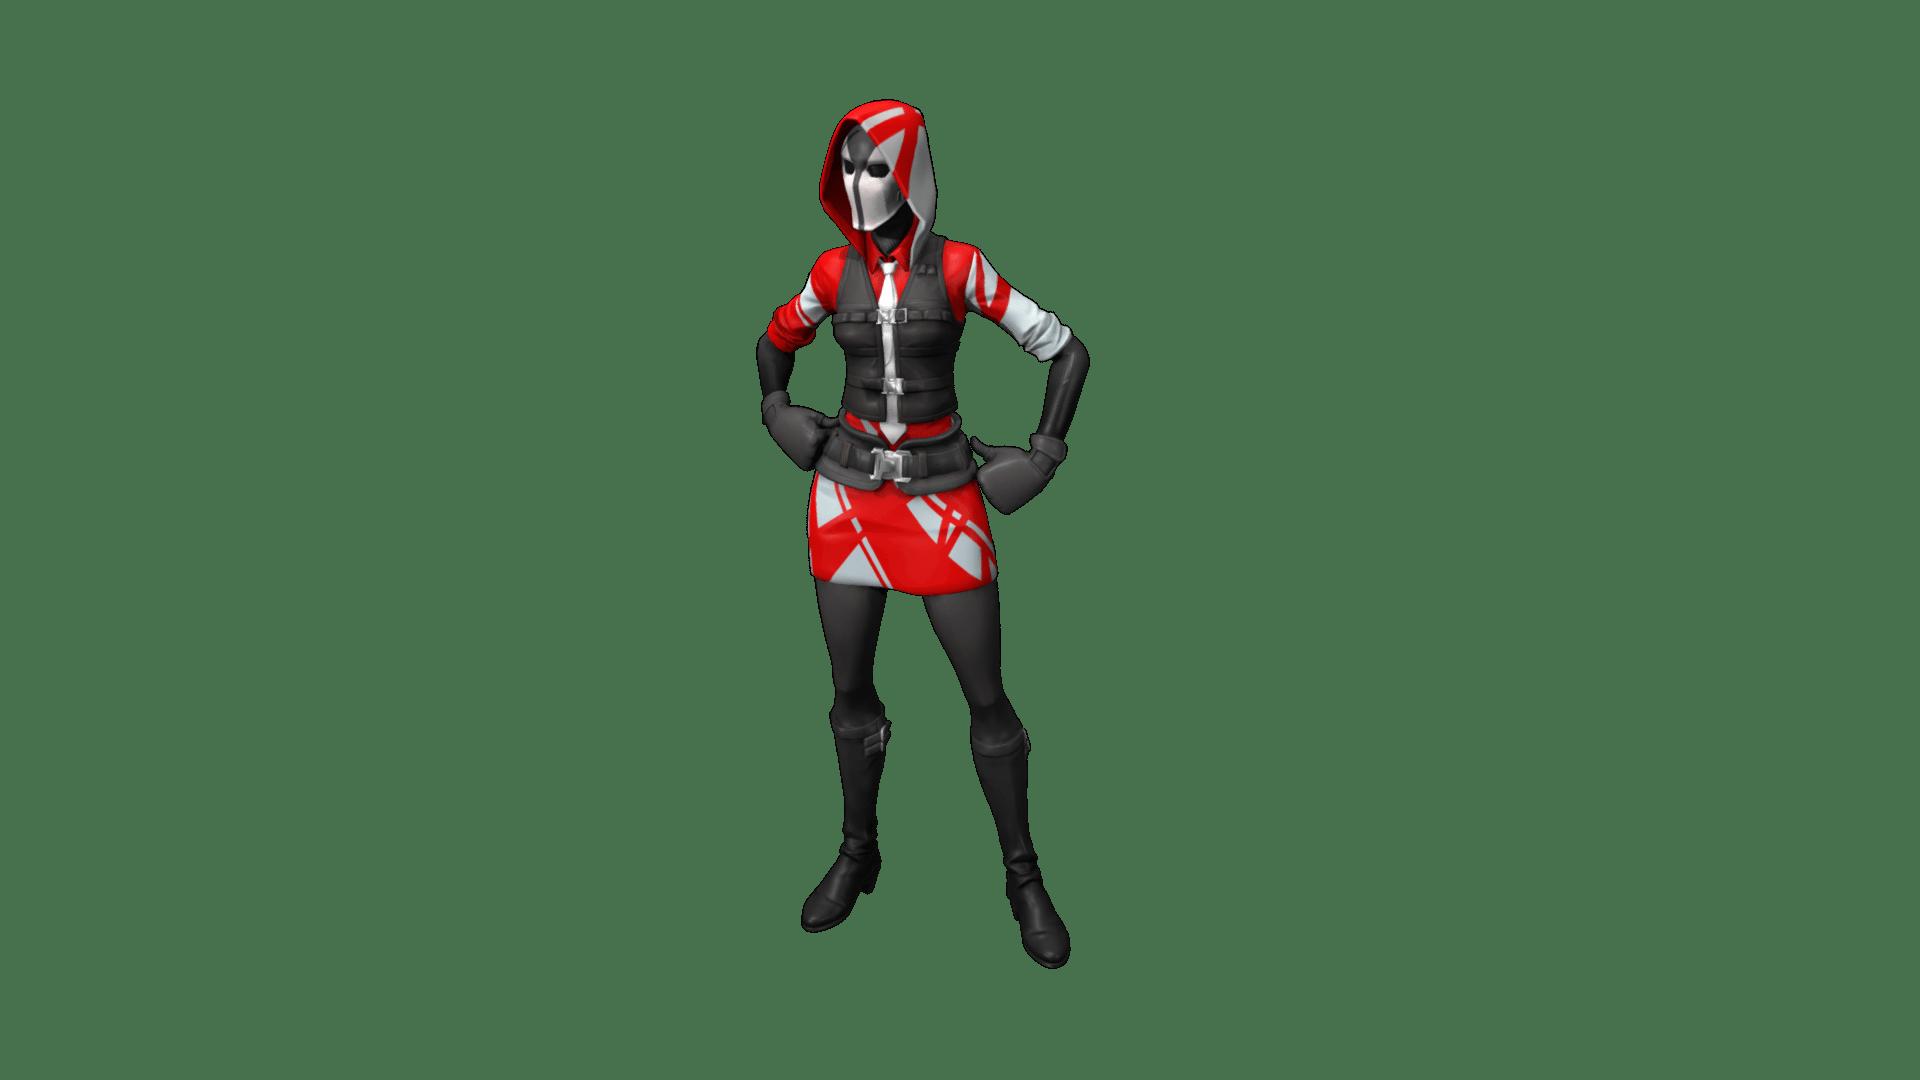 The Ace - Молния (The Ace)